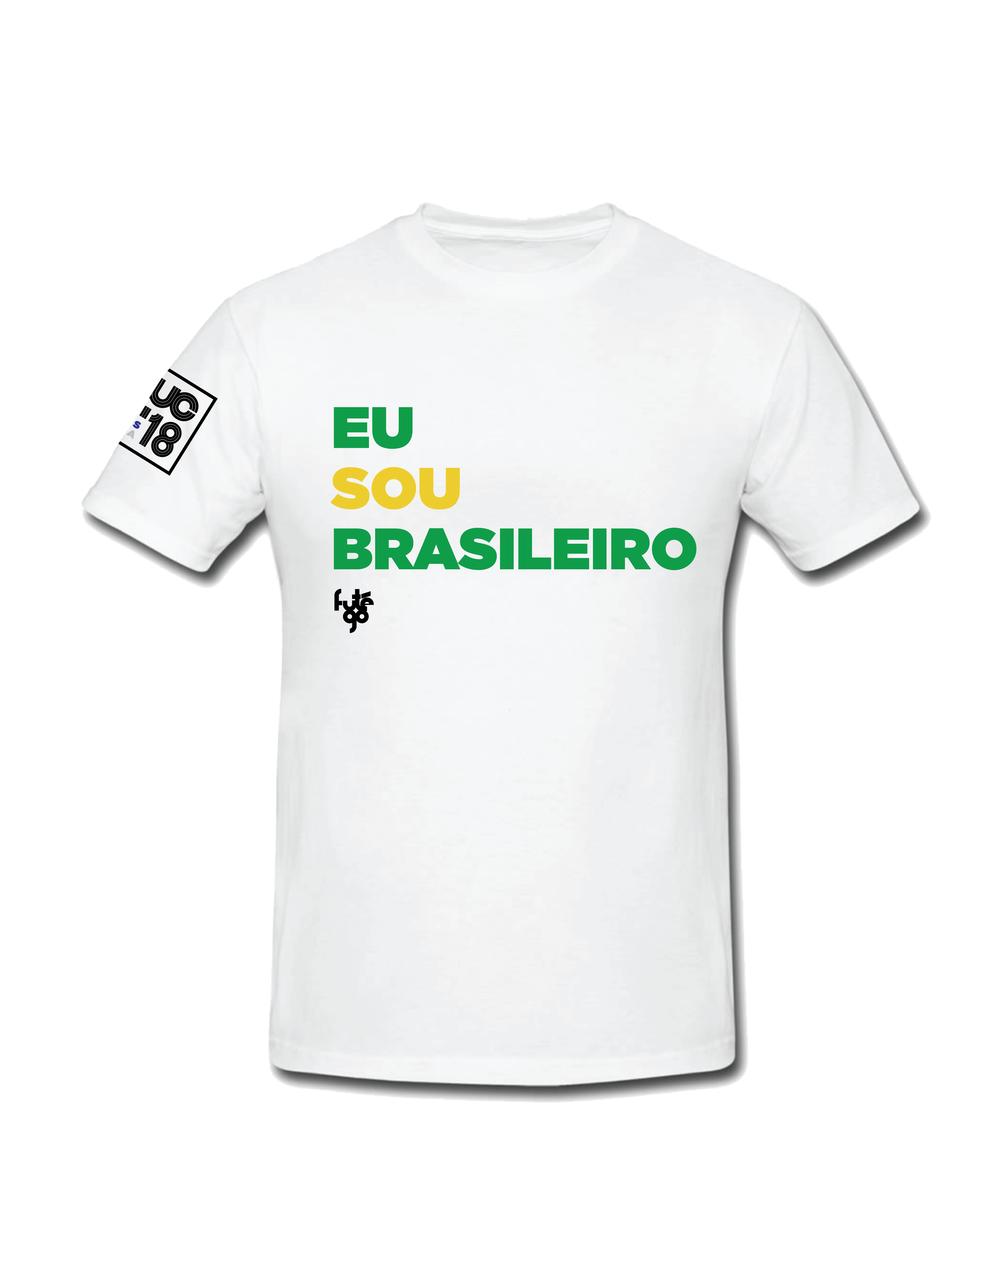 Futego_wc_2018_Chants-Brasil.png